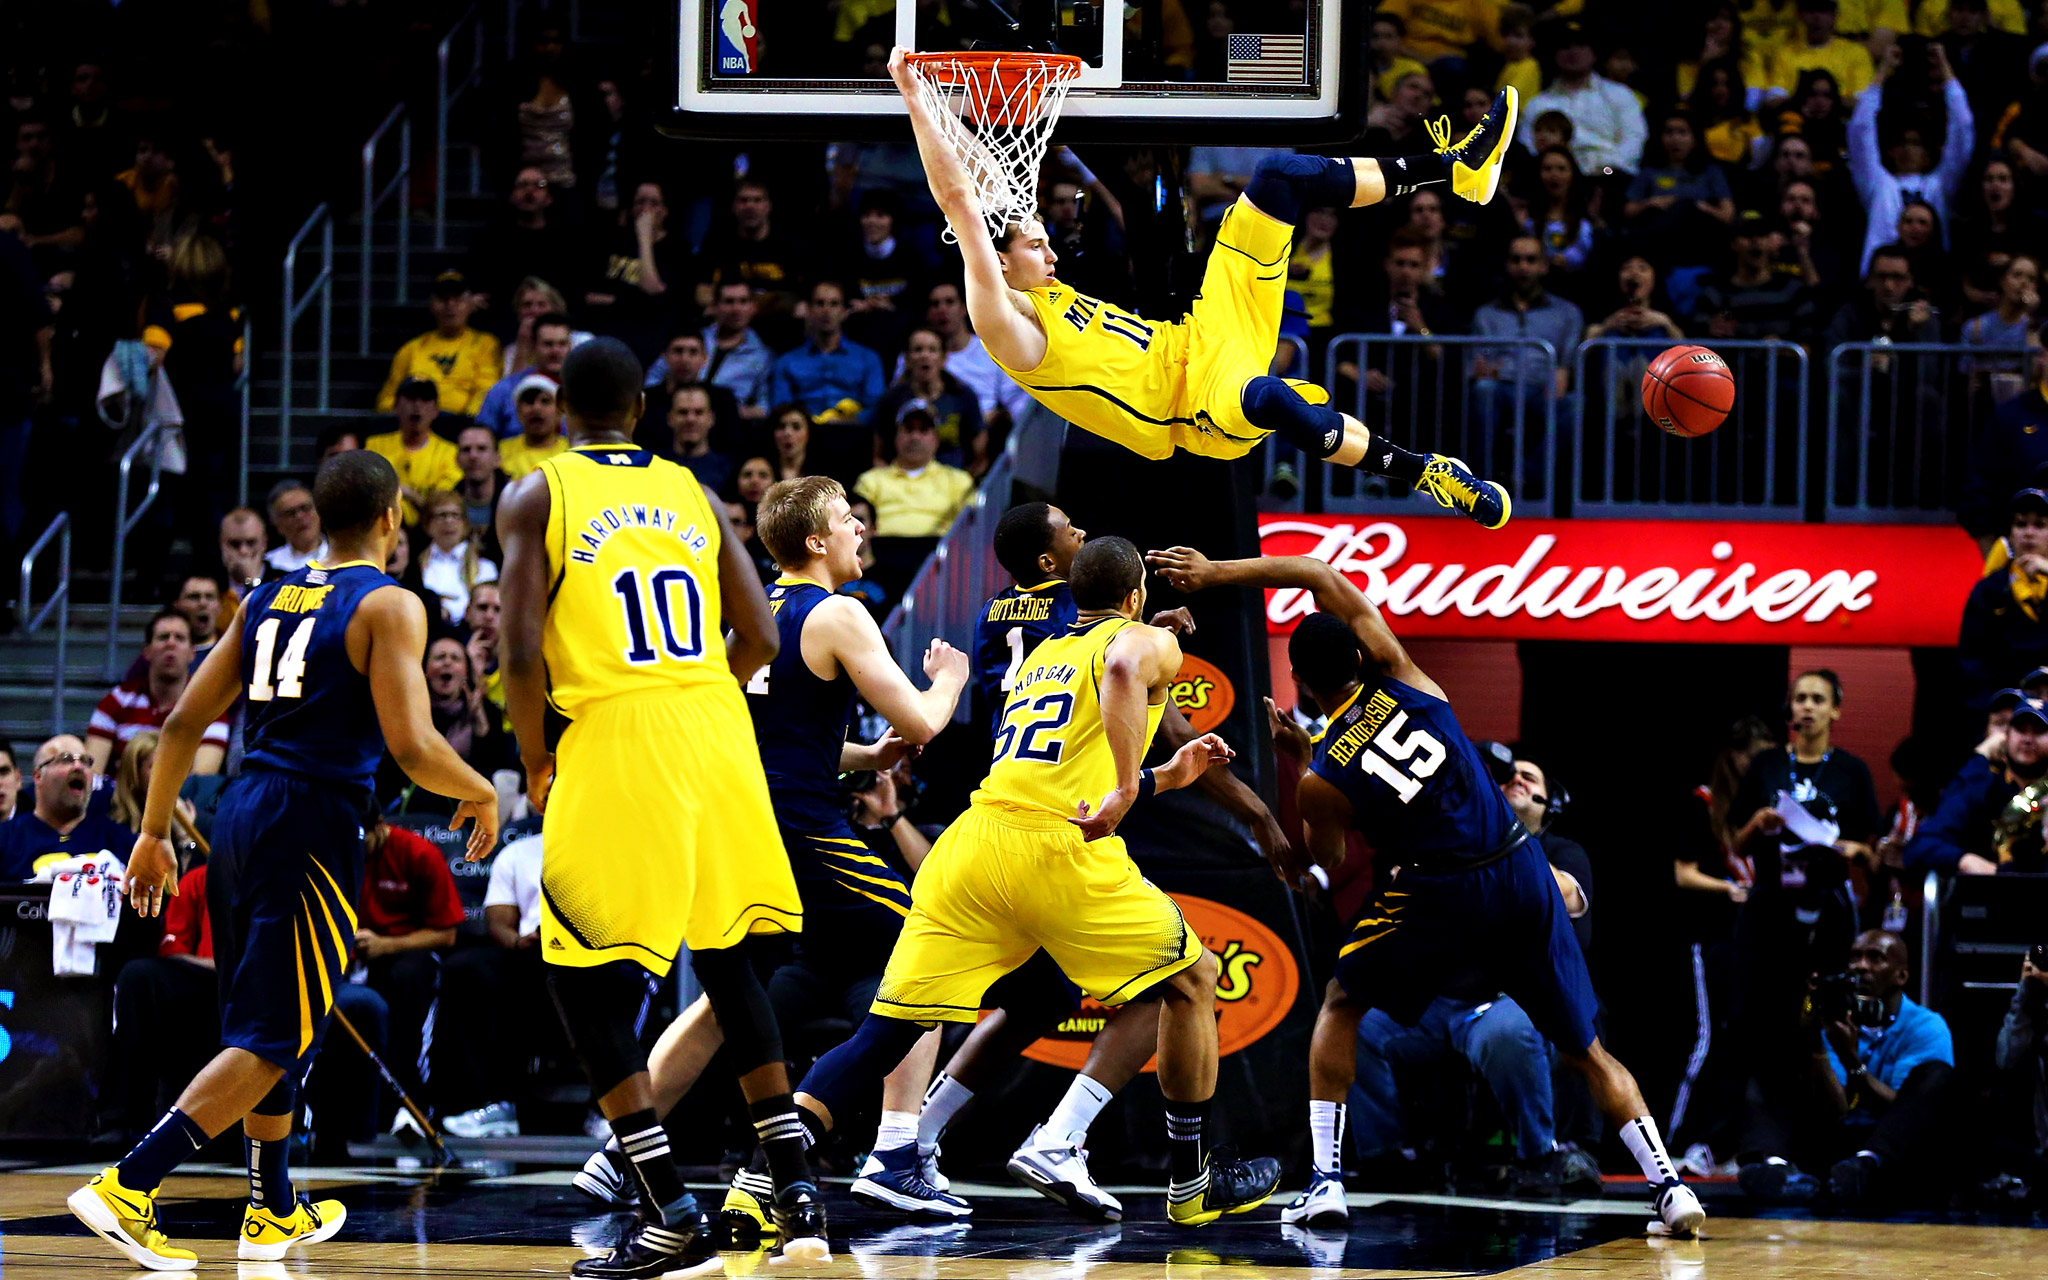 Free Download Michigan Wolverines Basketball Wallpaper